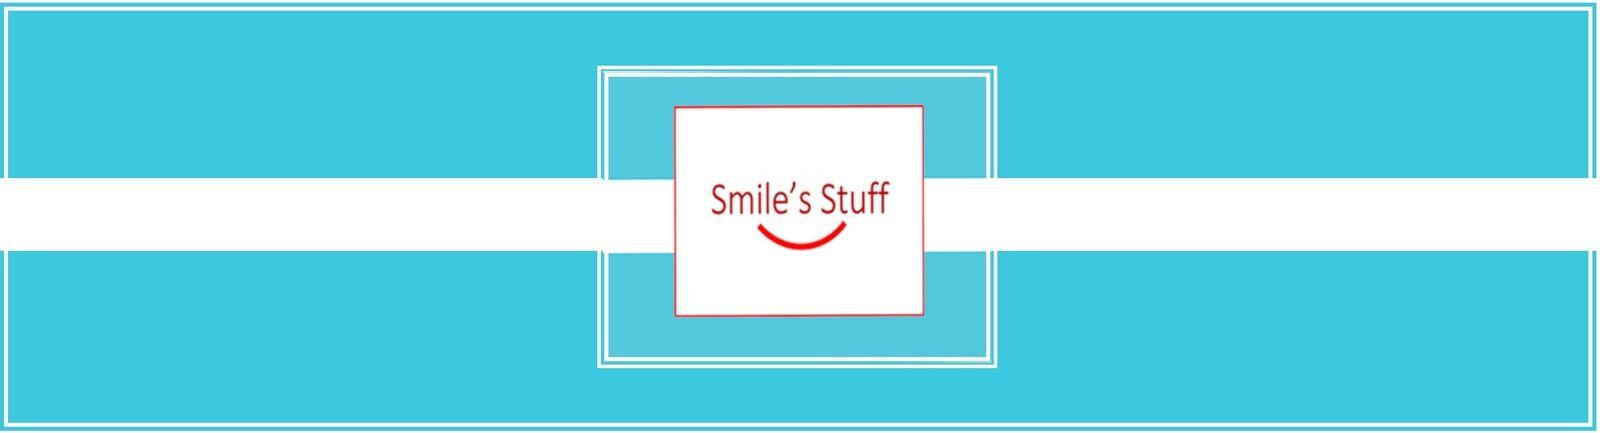 Smile's Stuff